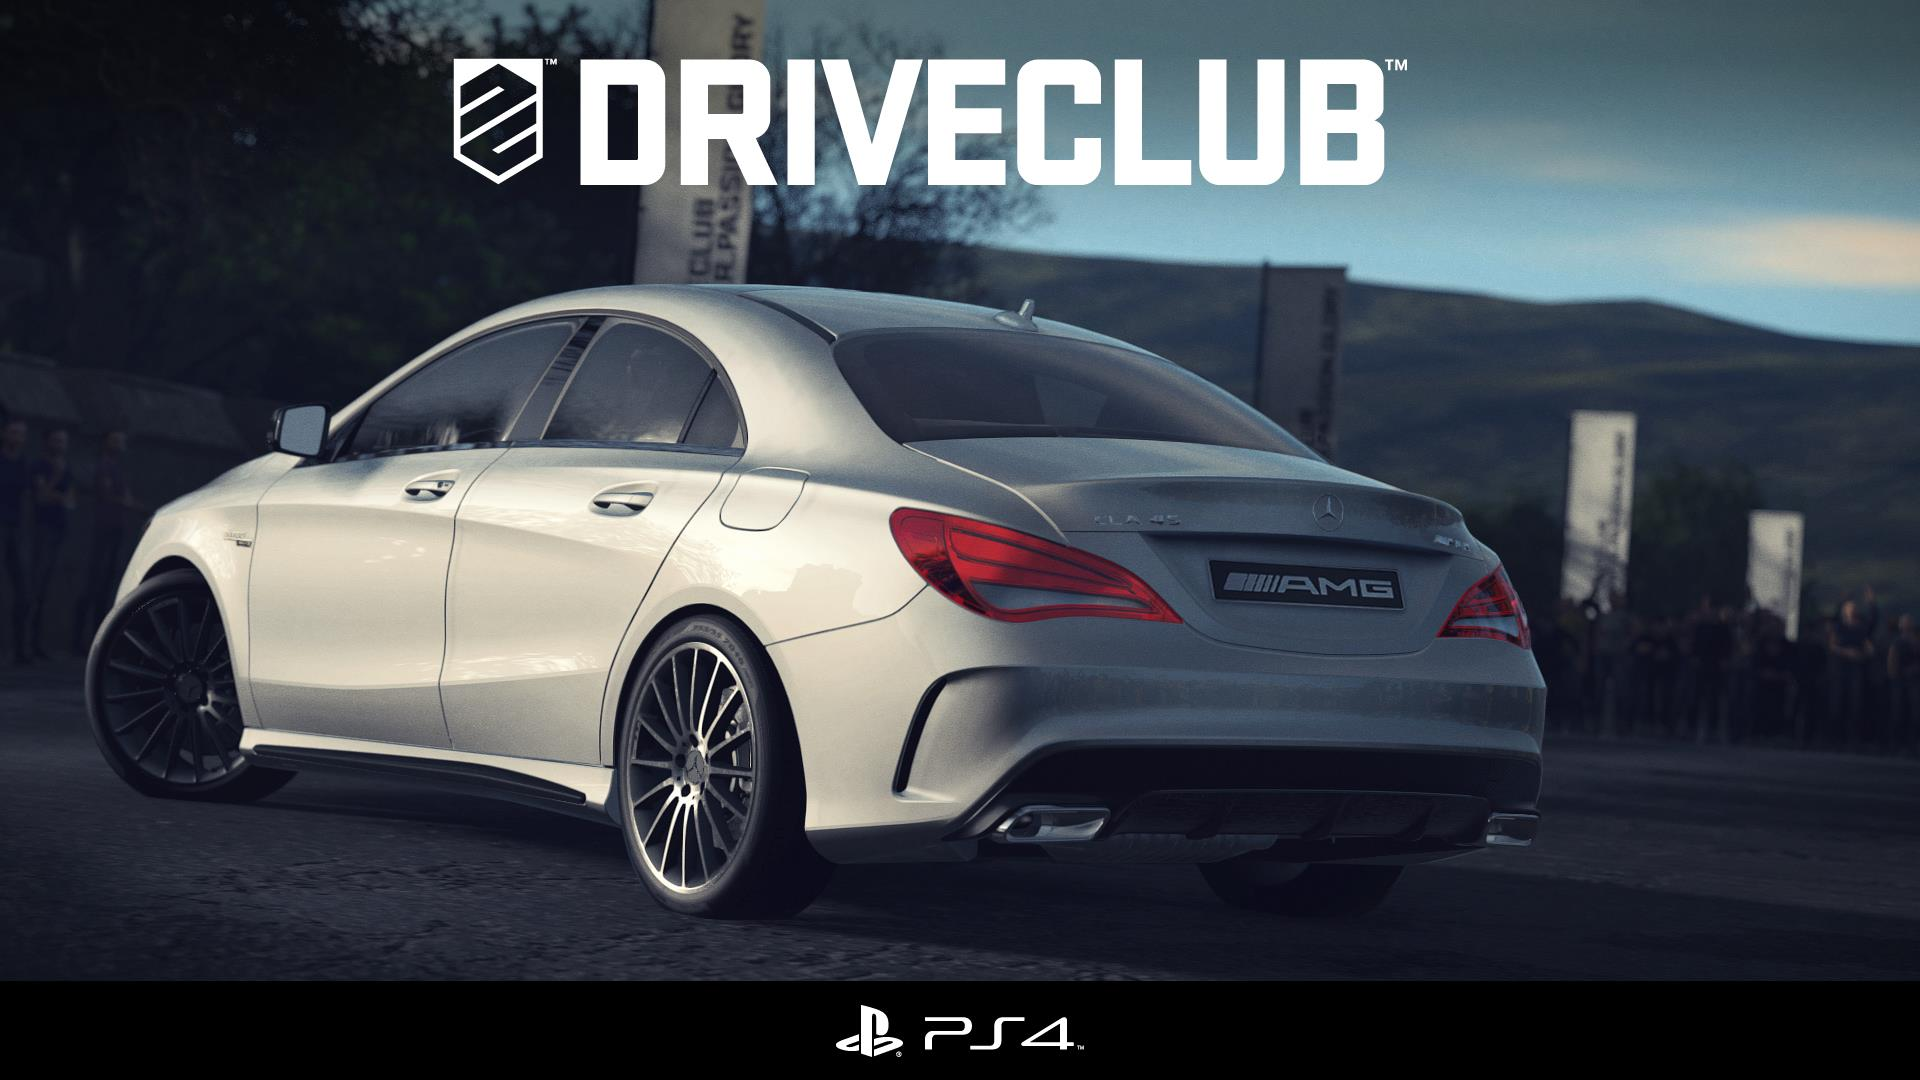 15 minutos de DriveClub en PS4 [GAMEPLAY]